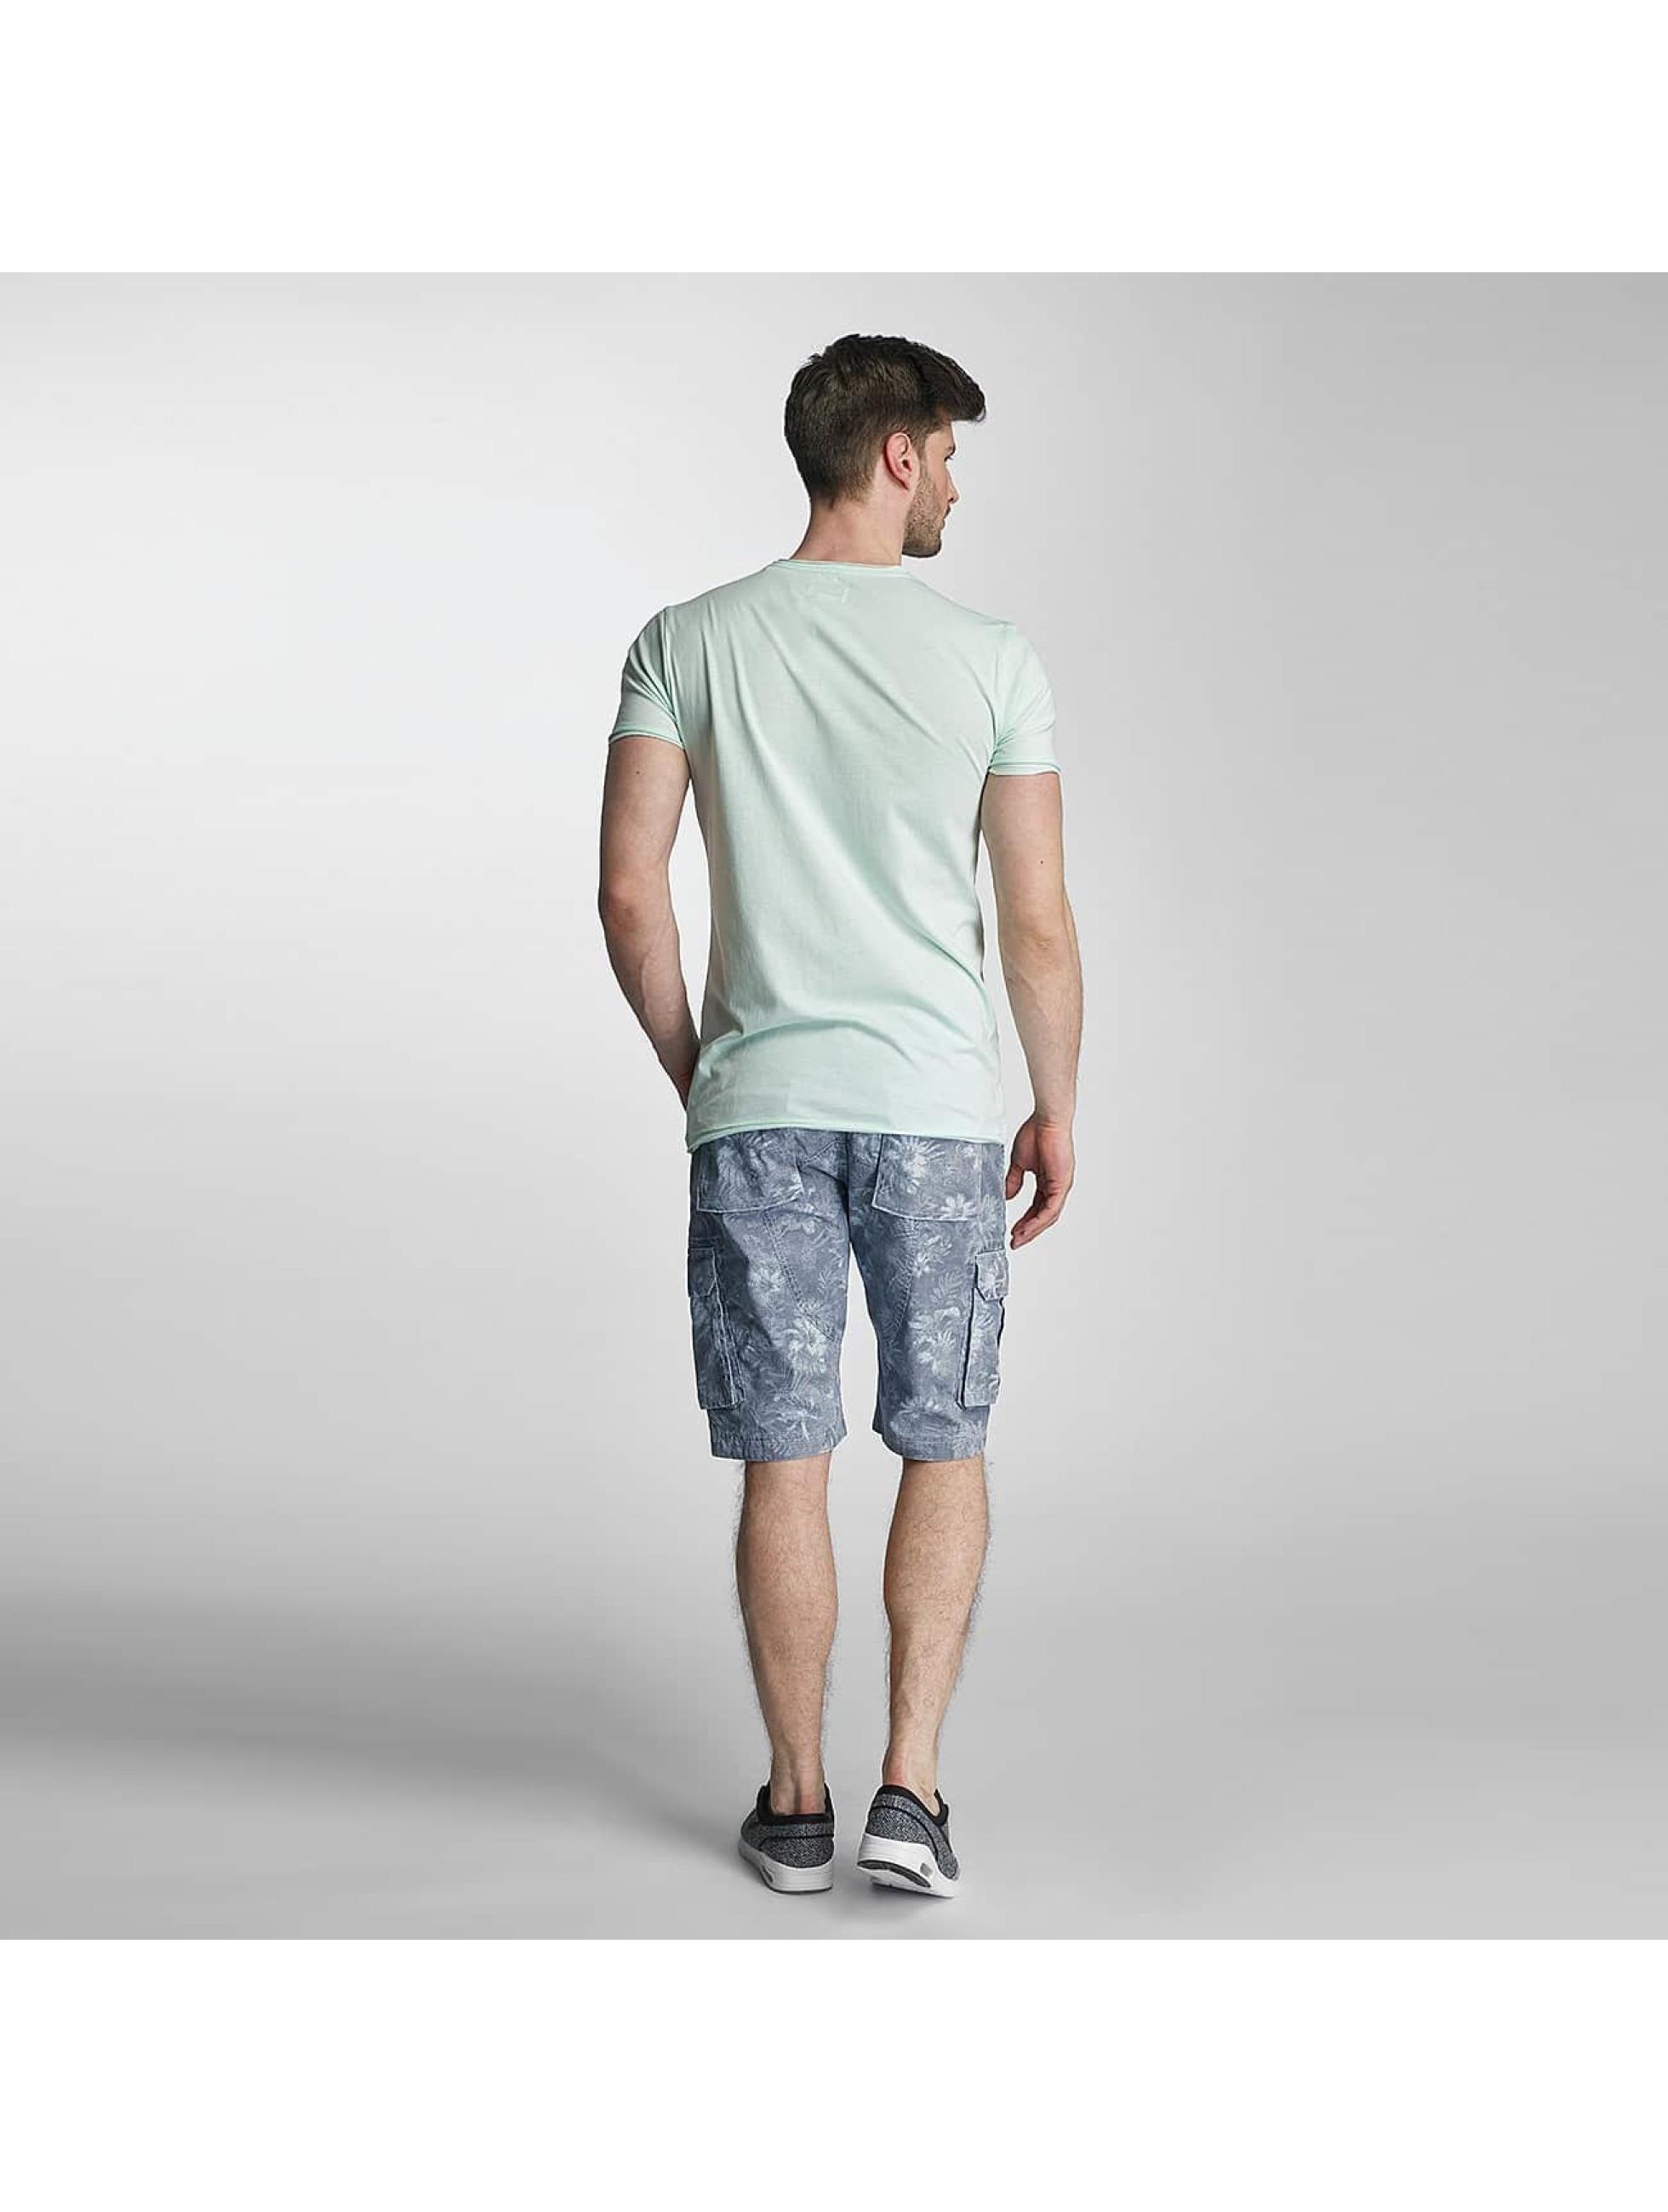 SHINE Original T-Shirt Mélange grün